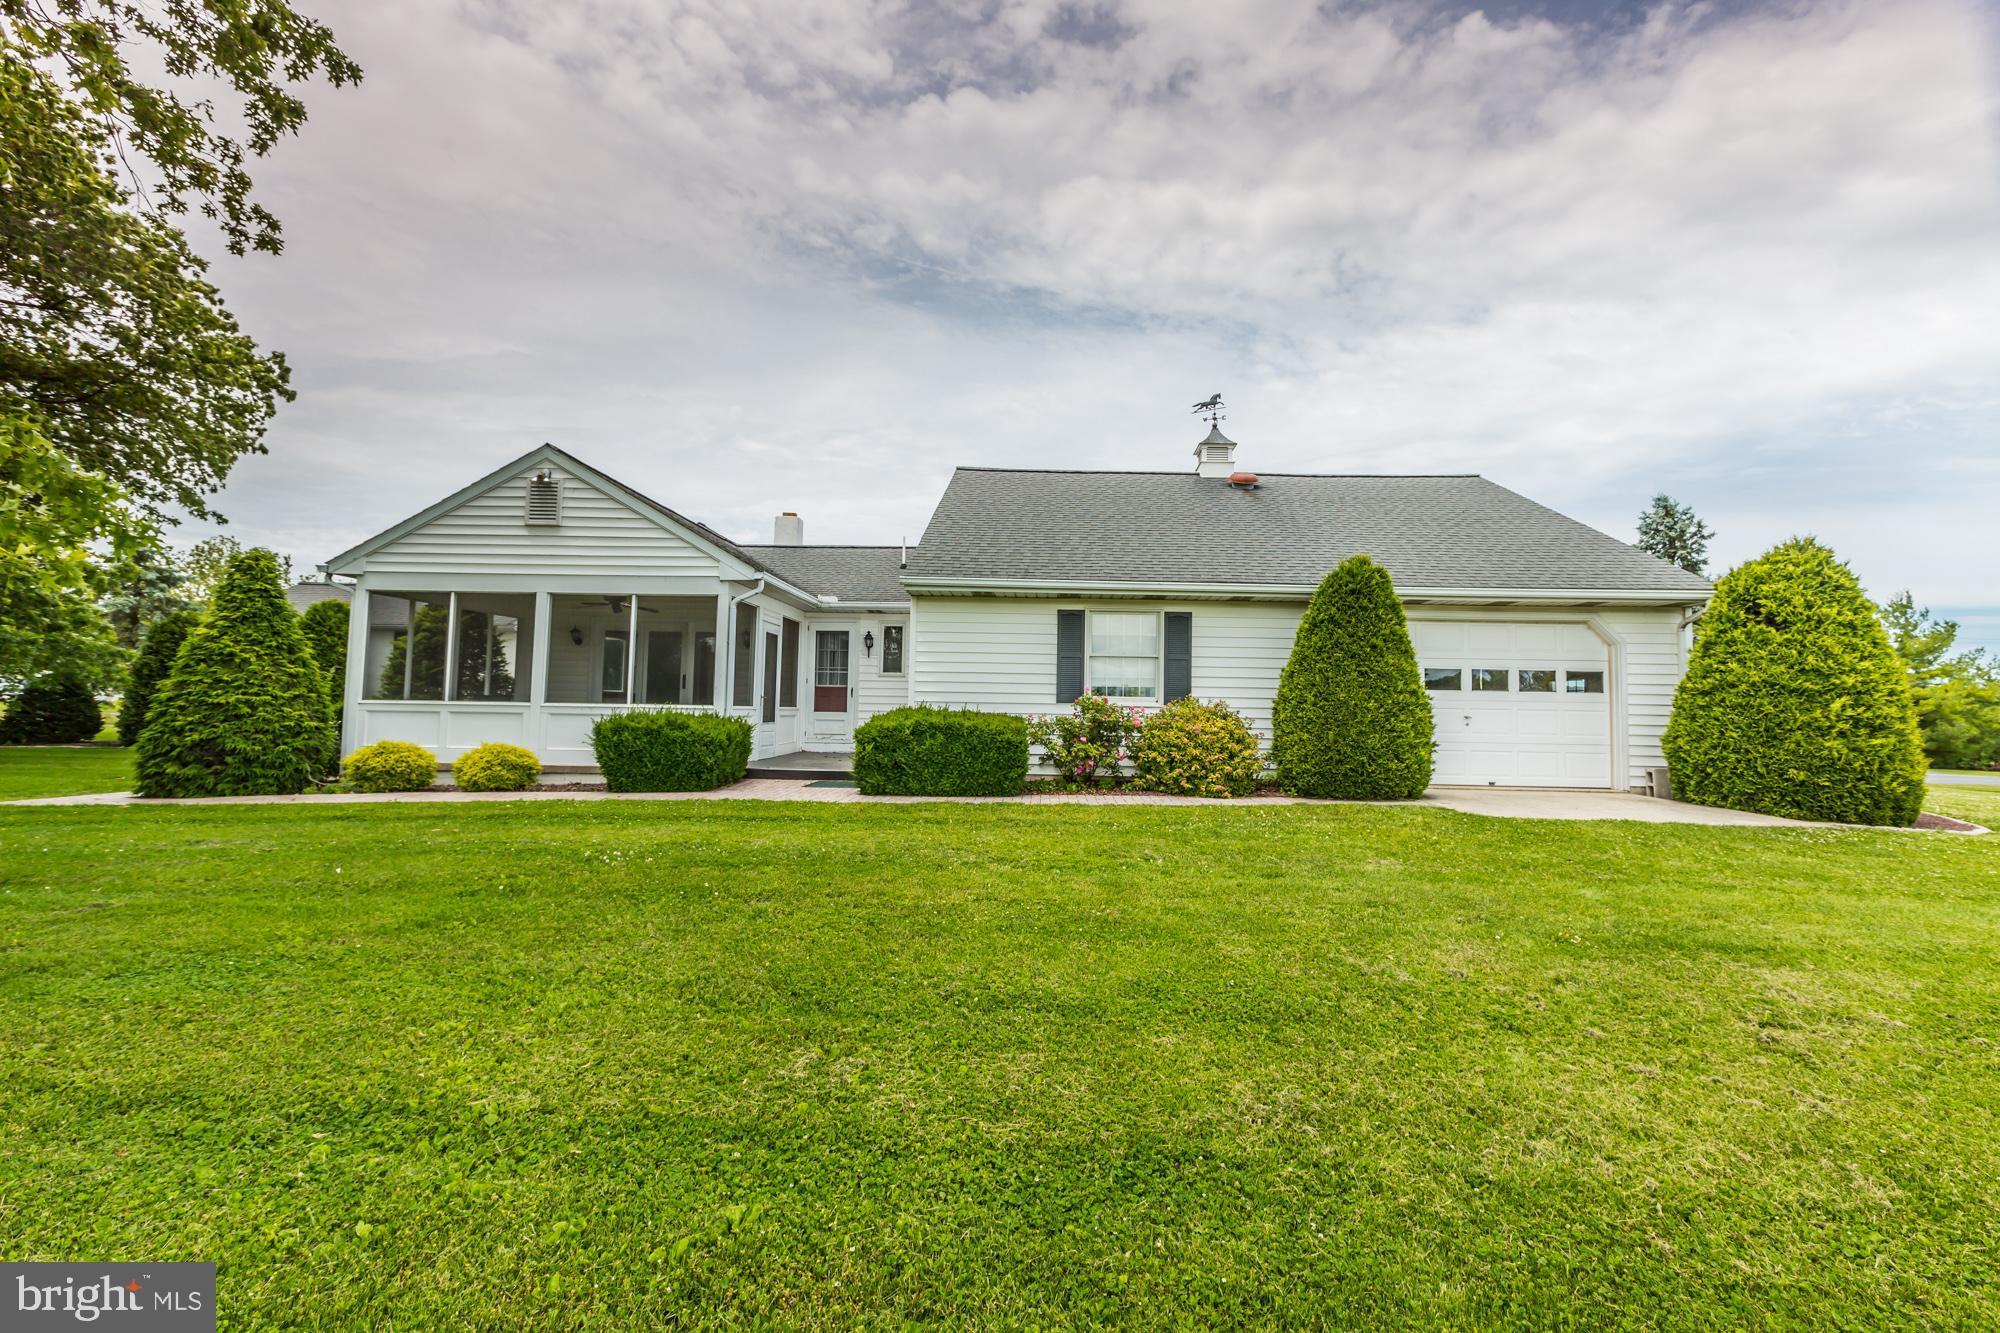 208 Suplee Rd, Honey Brook, PA 19344